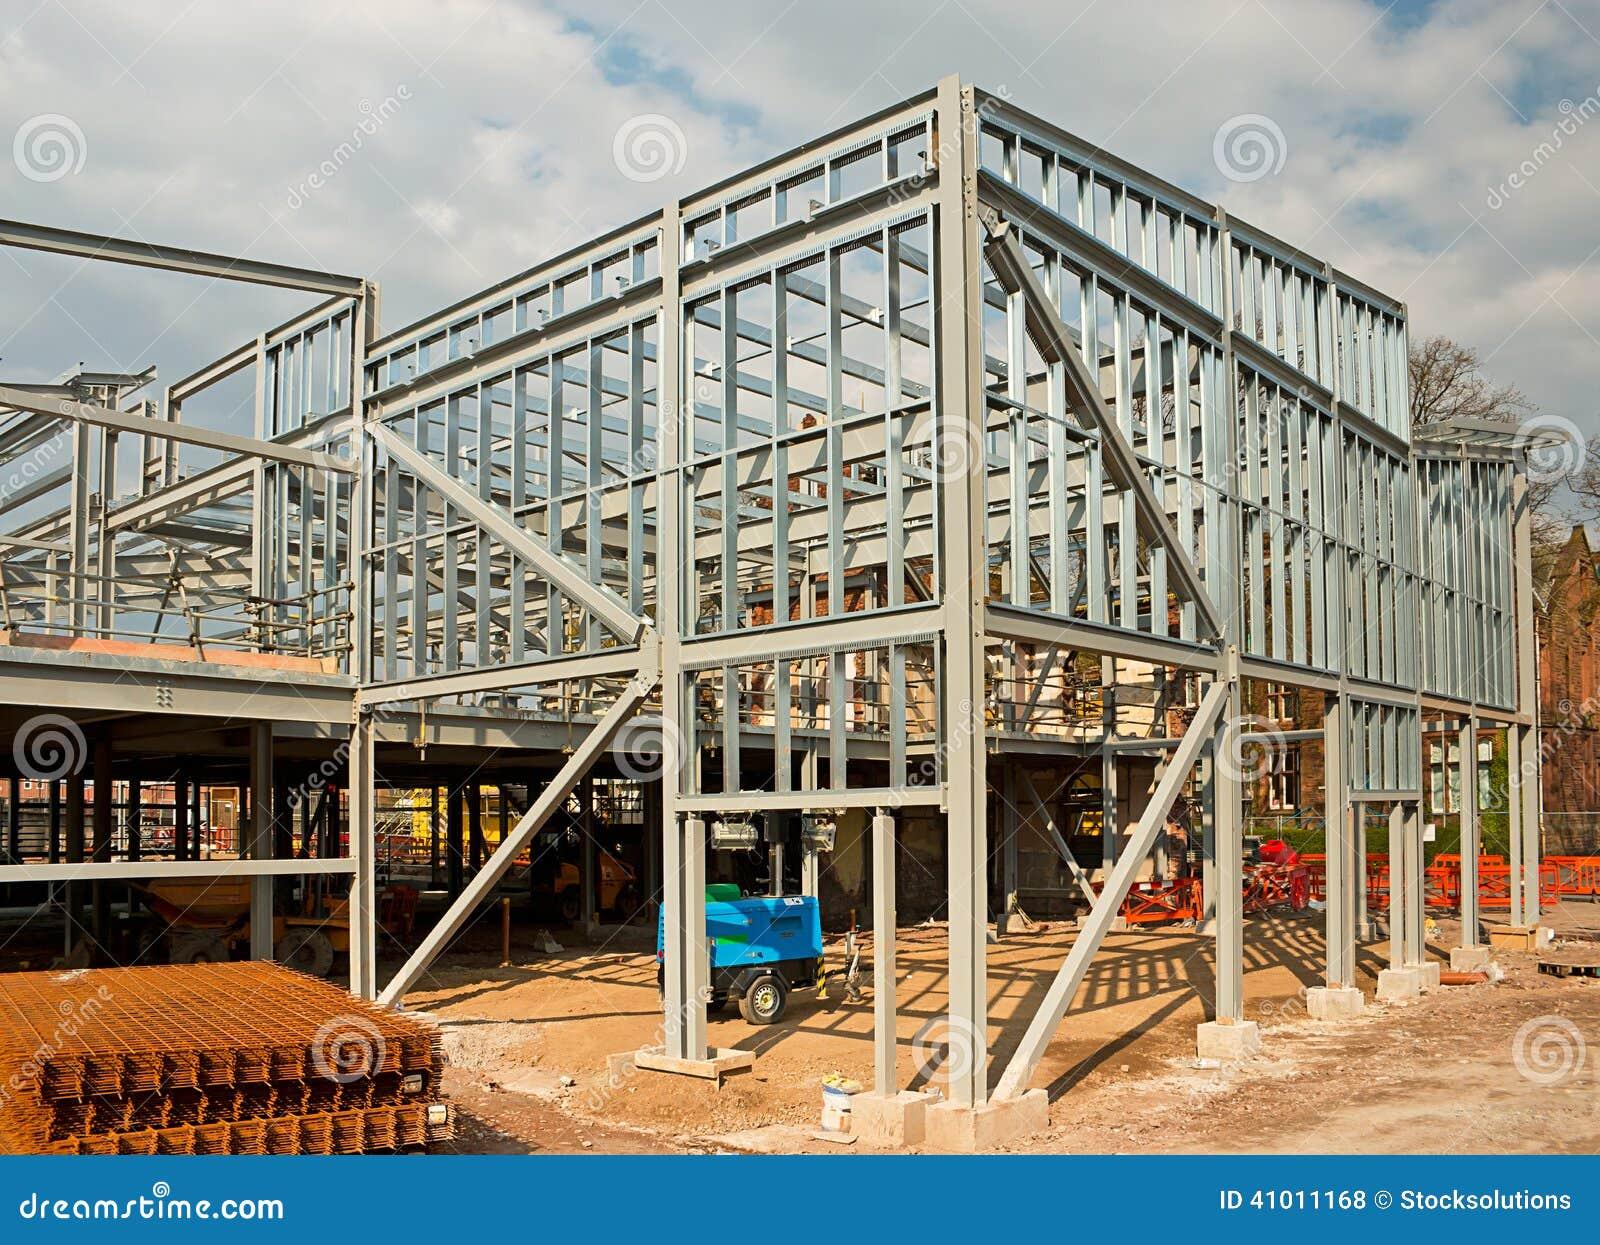 Steel Frame Skyscraper : Steel framed building stock photo image of agricultural